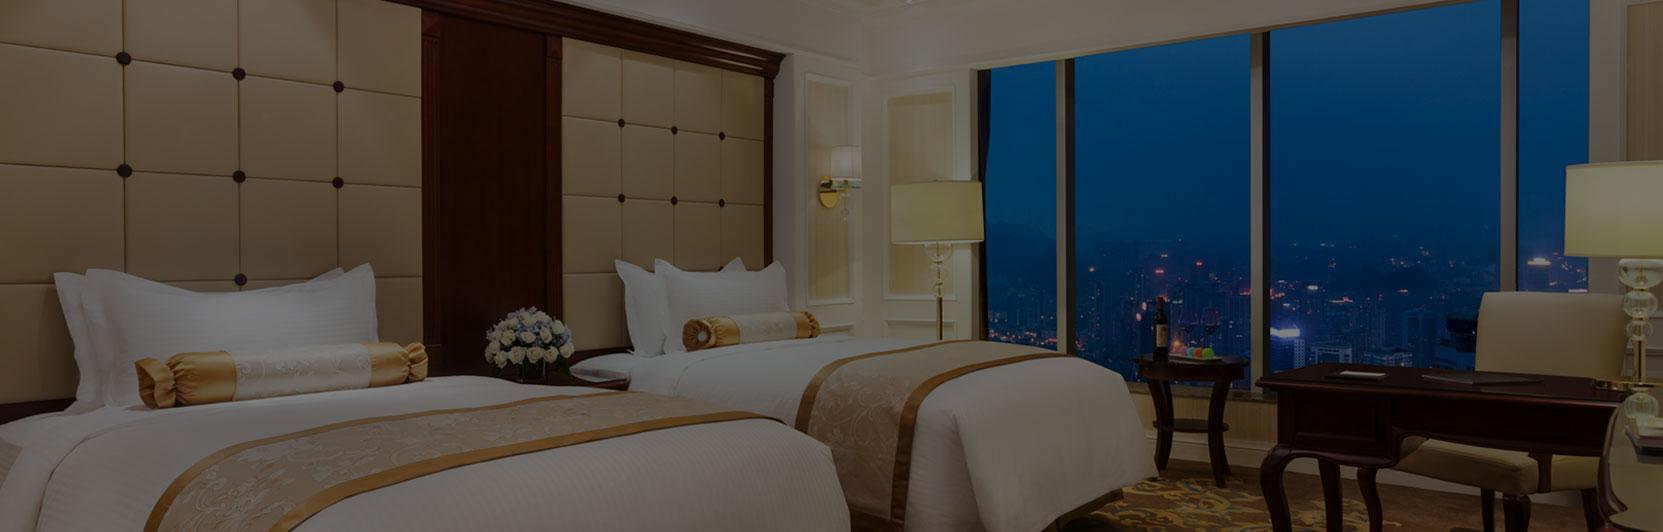 Hotel photography of the executive room twin beds at Kempinski Hotel Guiyang in China